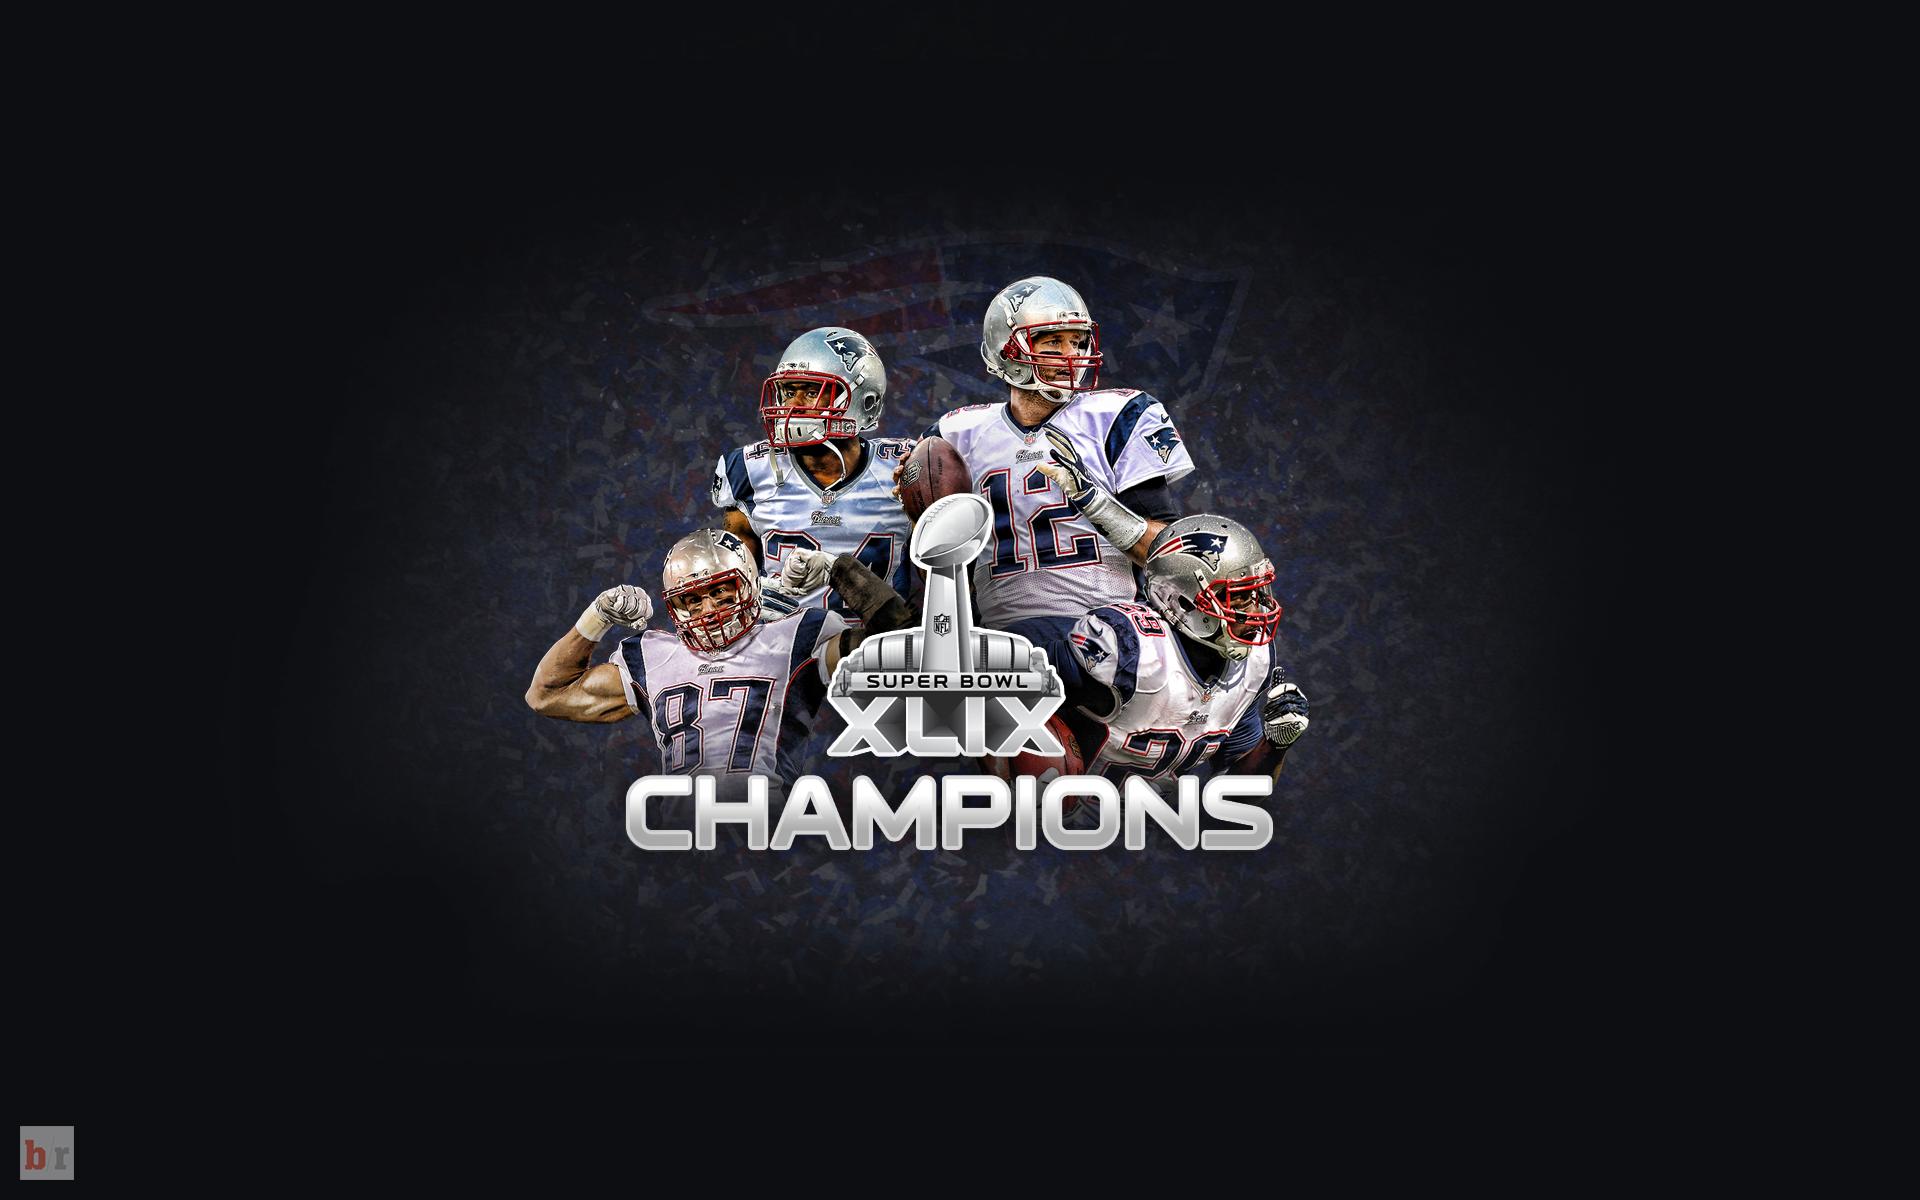 45+ Best Inspirational High Quality New England Patriots